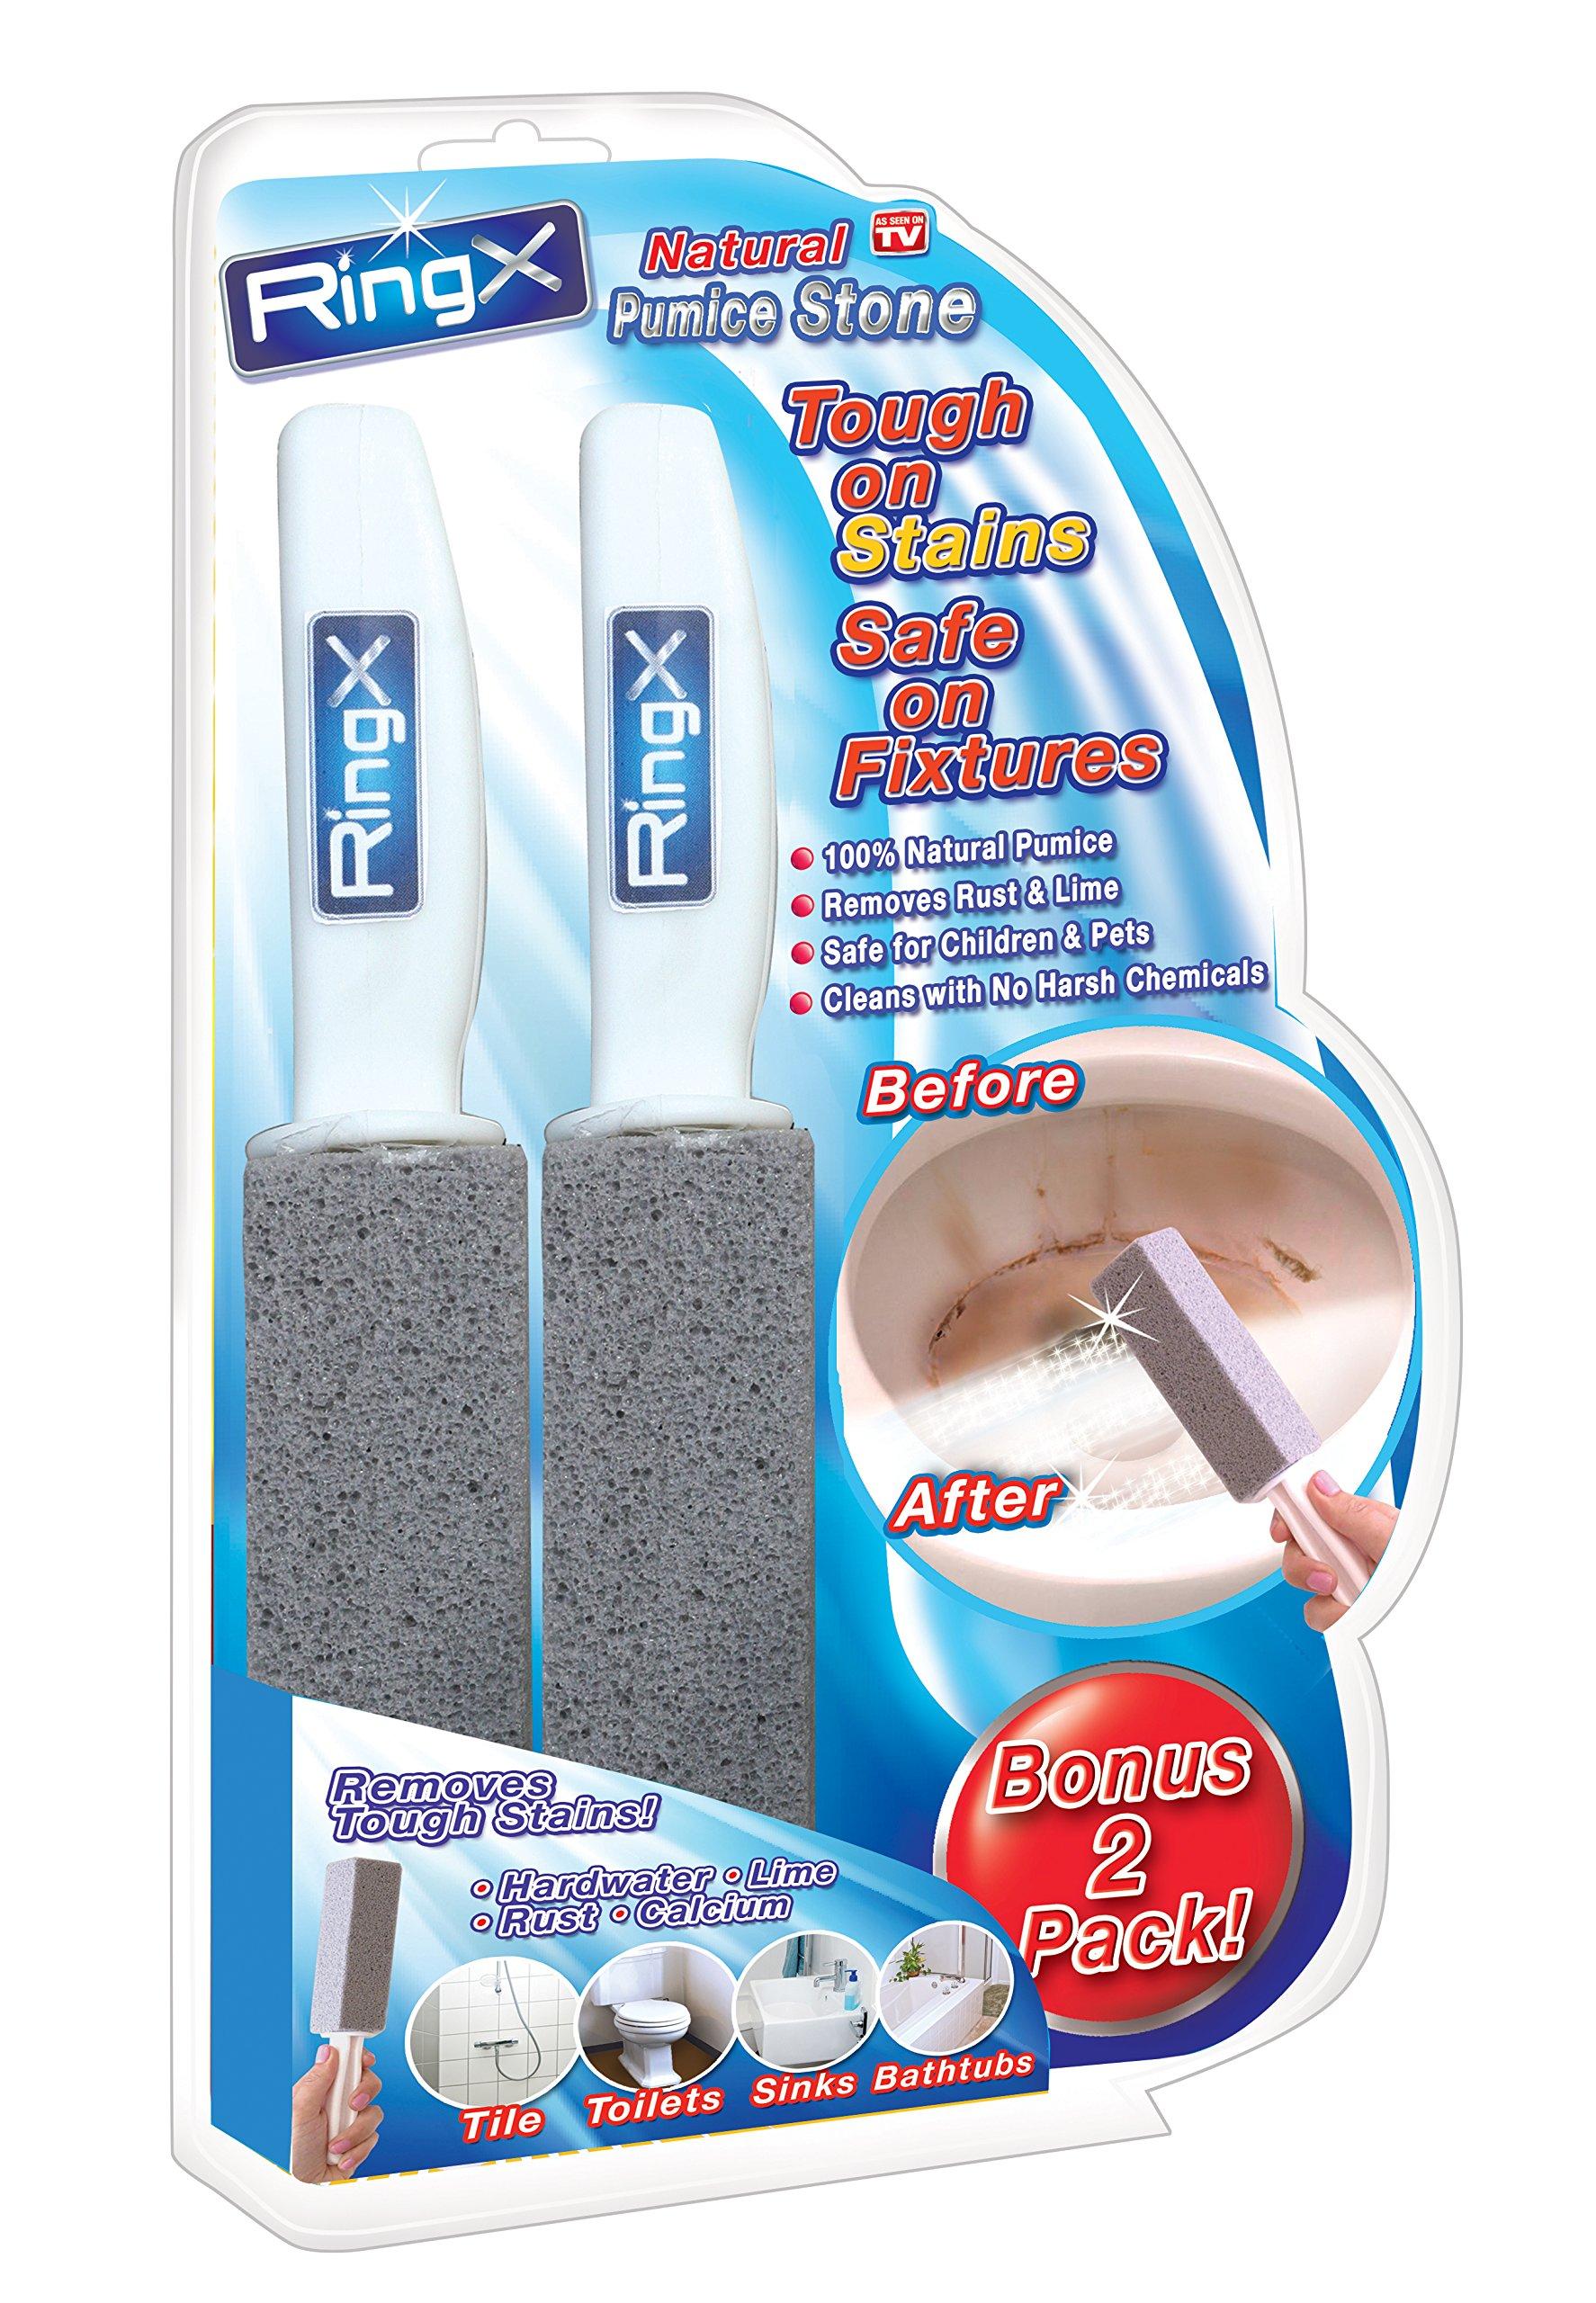 Spark Innovators RingX Natural Pumice Stone Toilet Bowl Cleaner